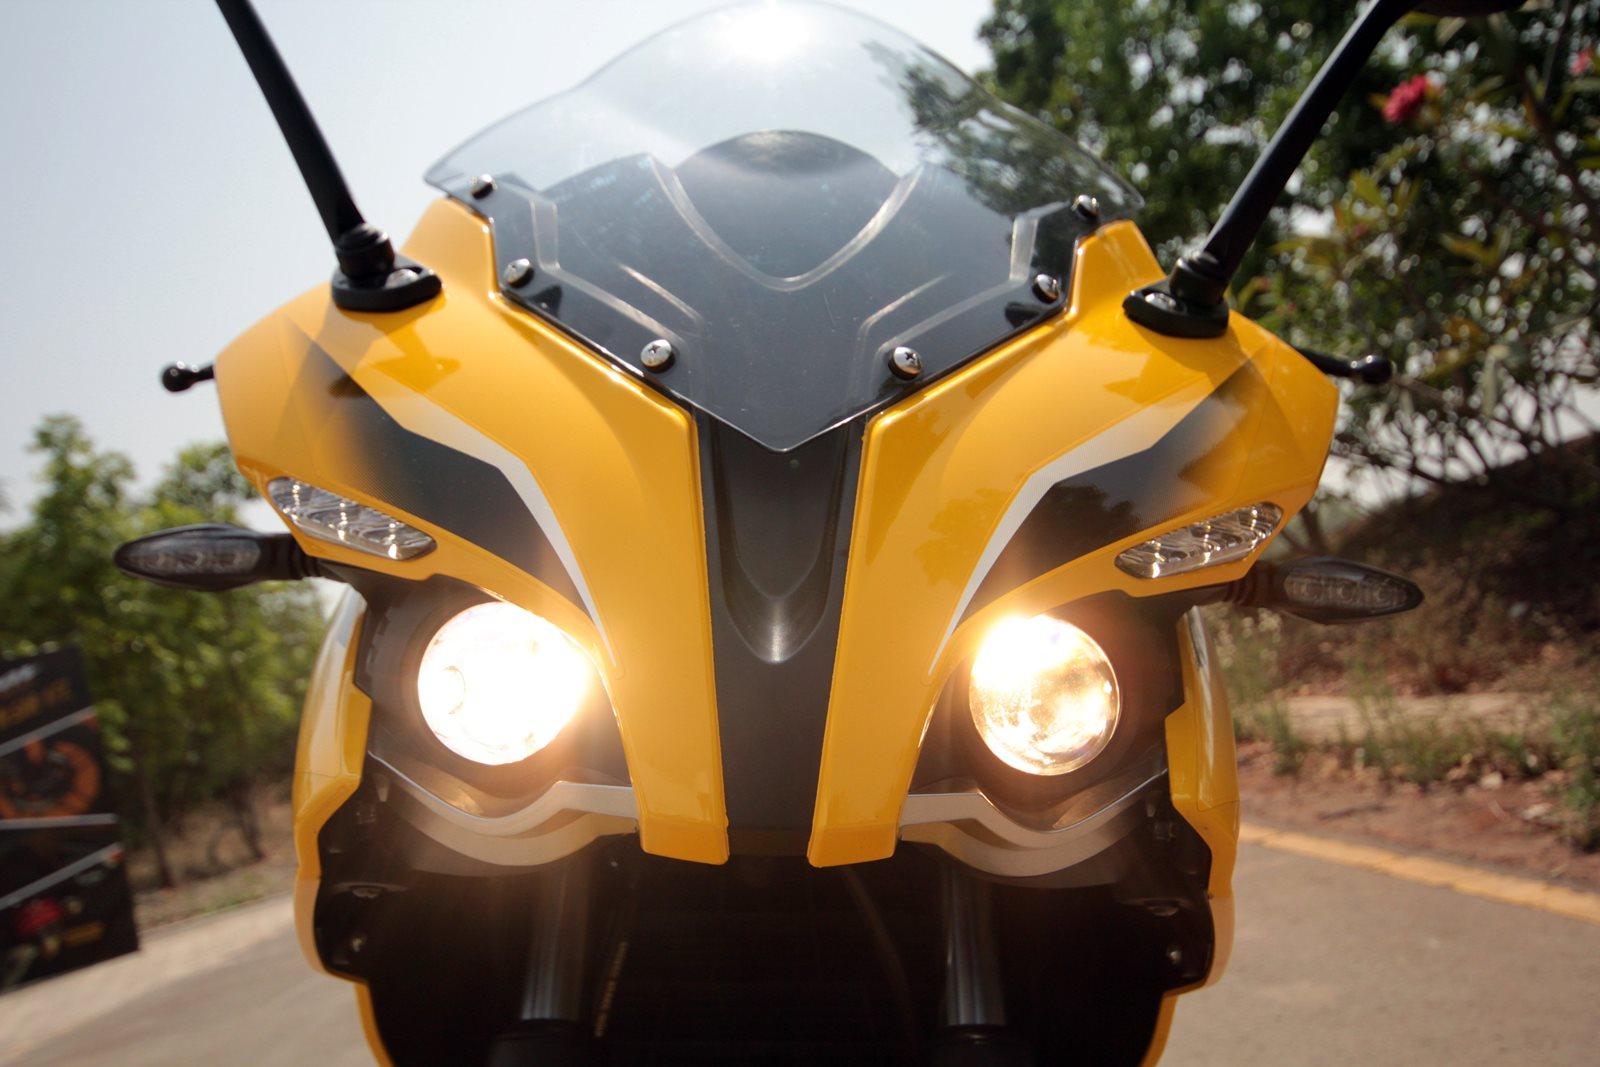 Pulsar RS 200 lights on